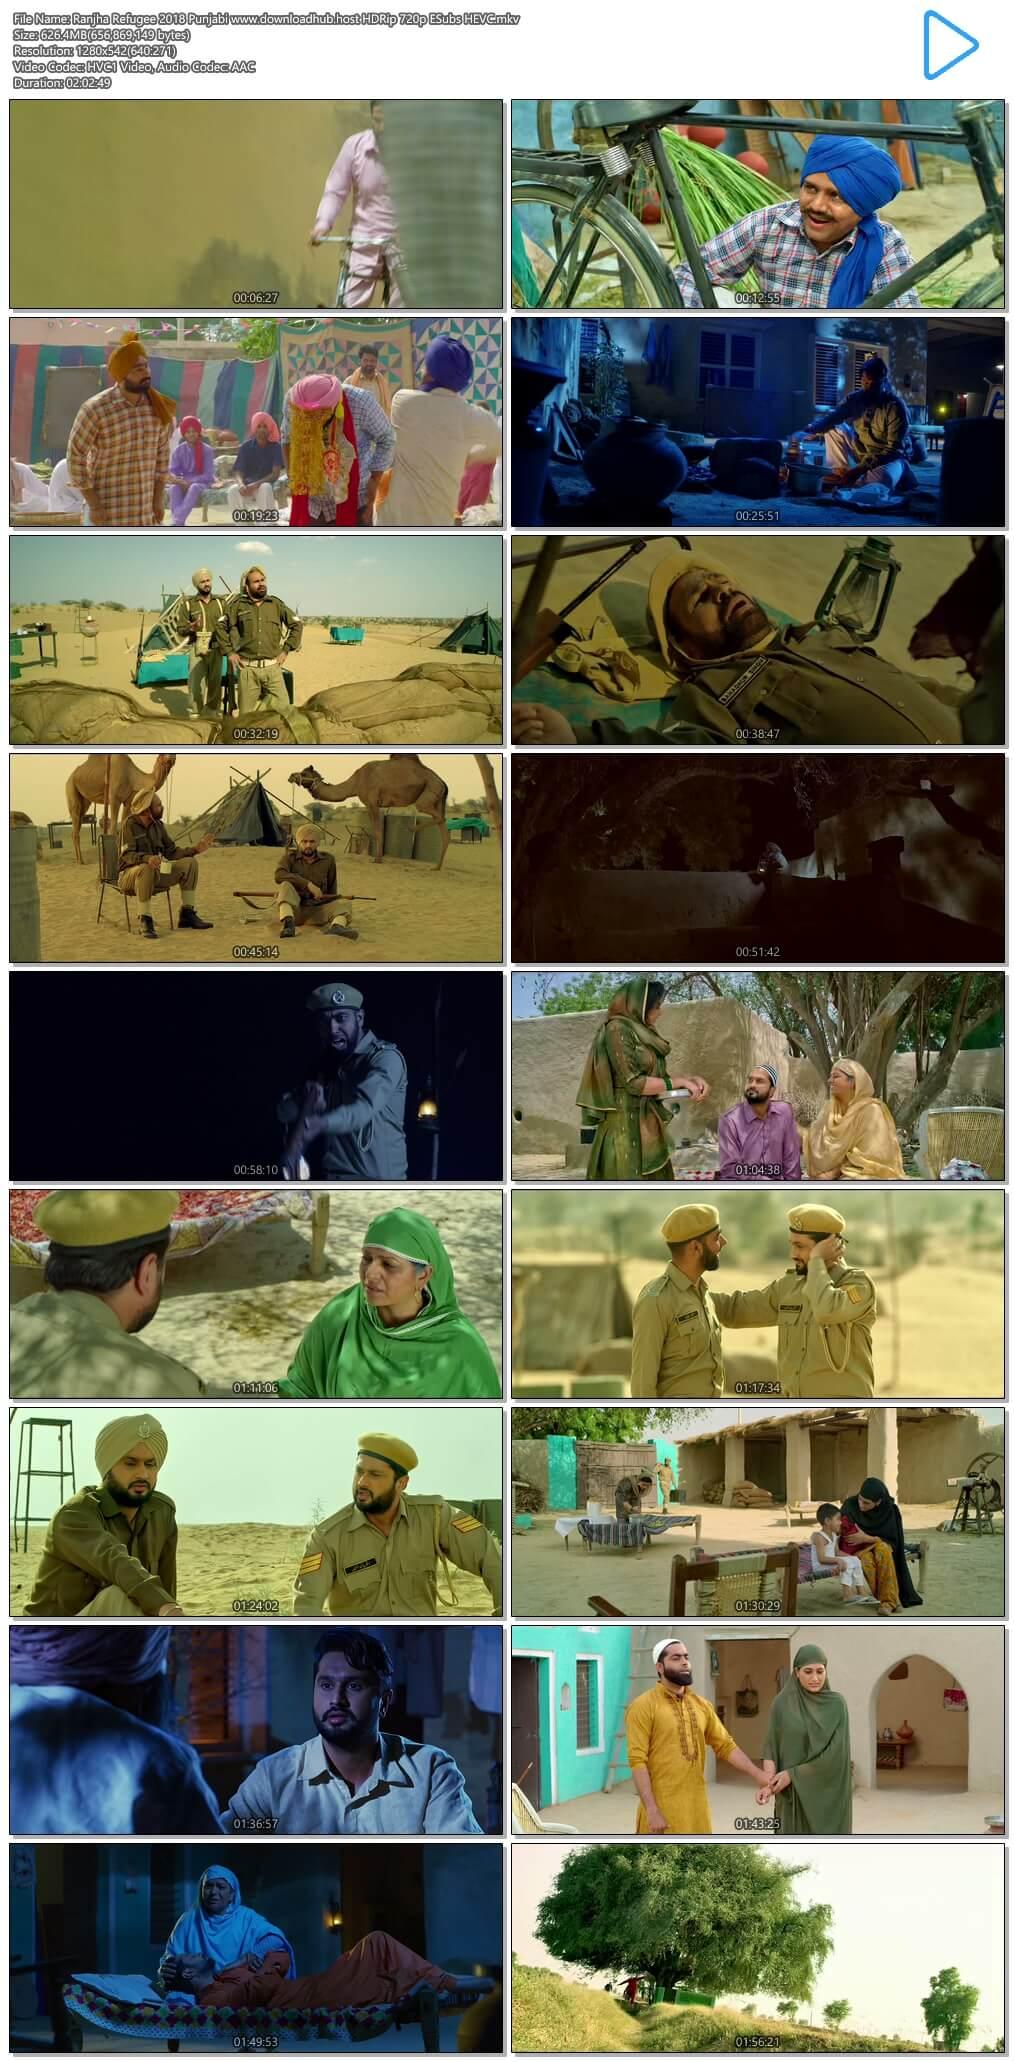 Ranjha Refugee 2018 Punjabi 600MB HDRip 720p ESubs HEVC